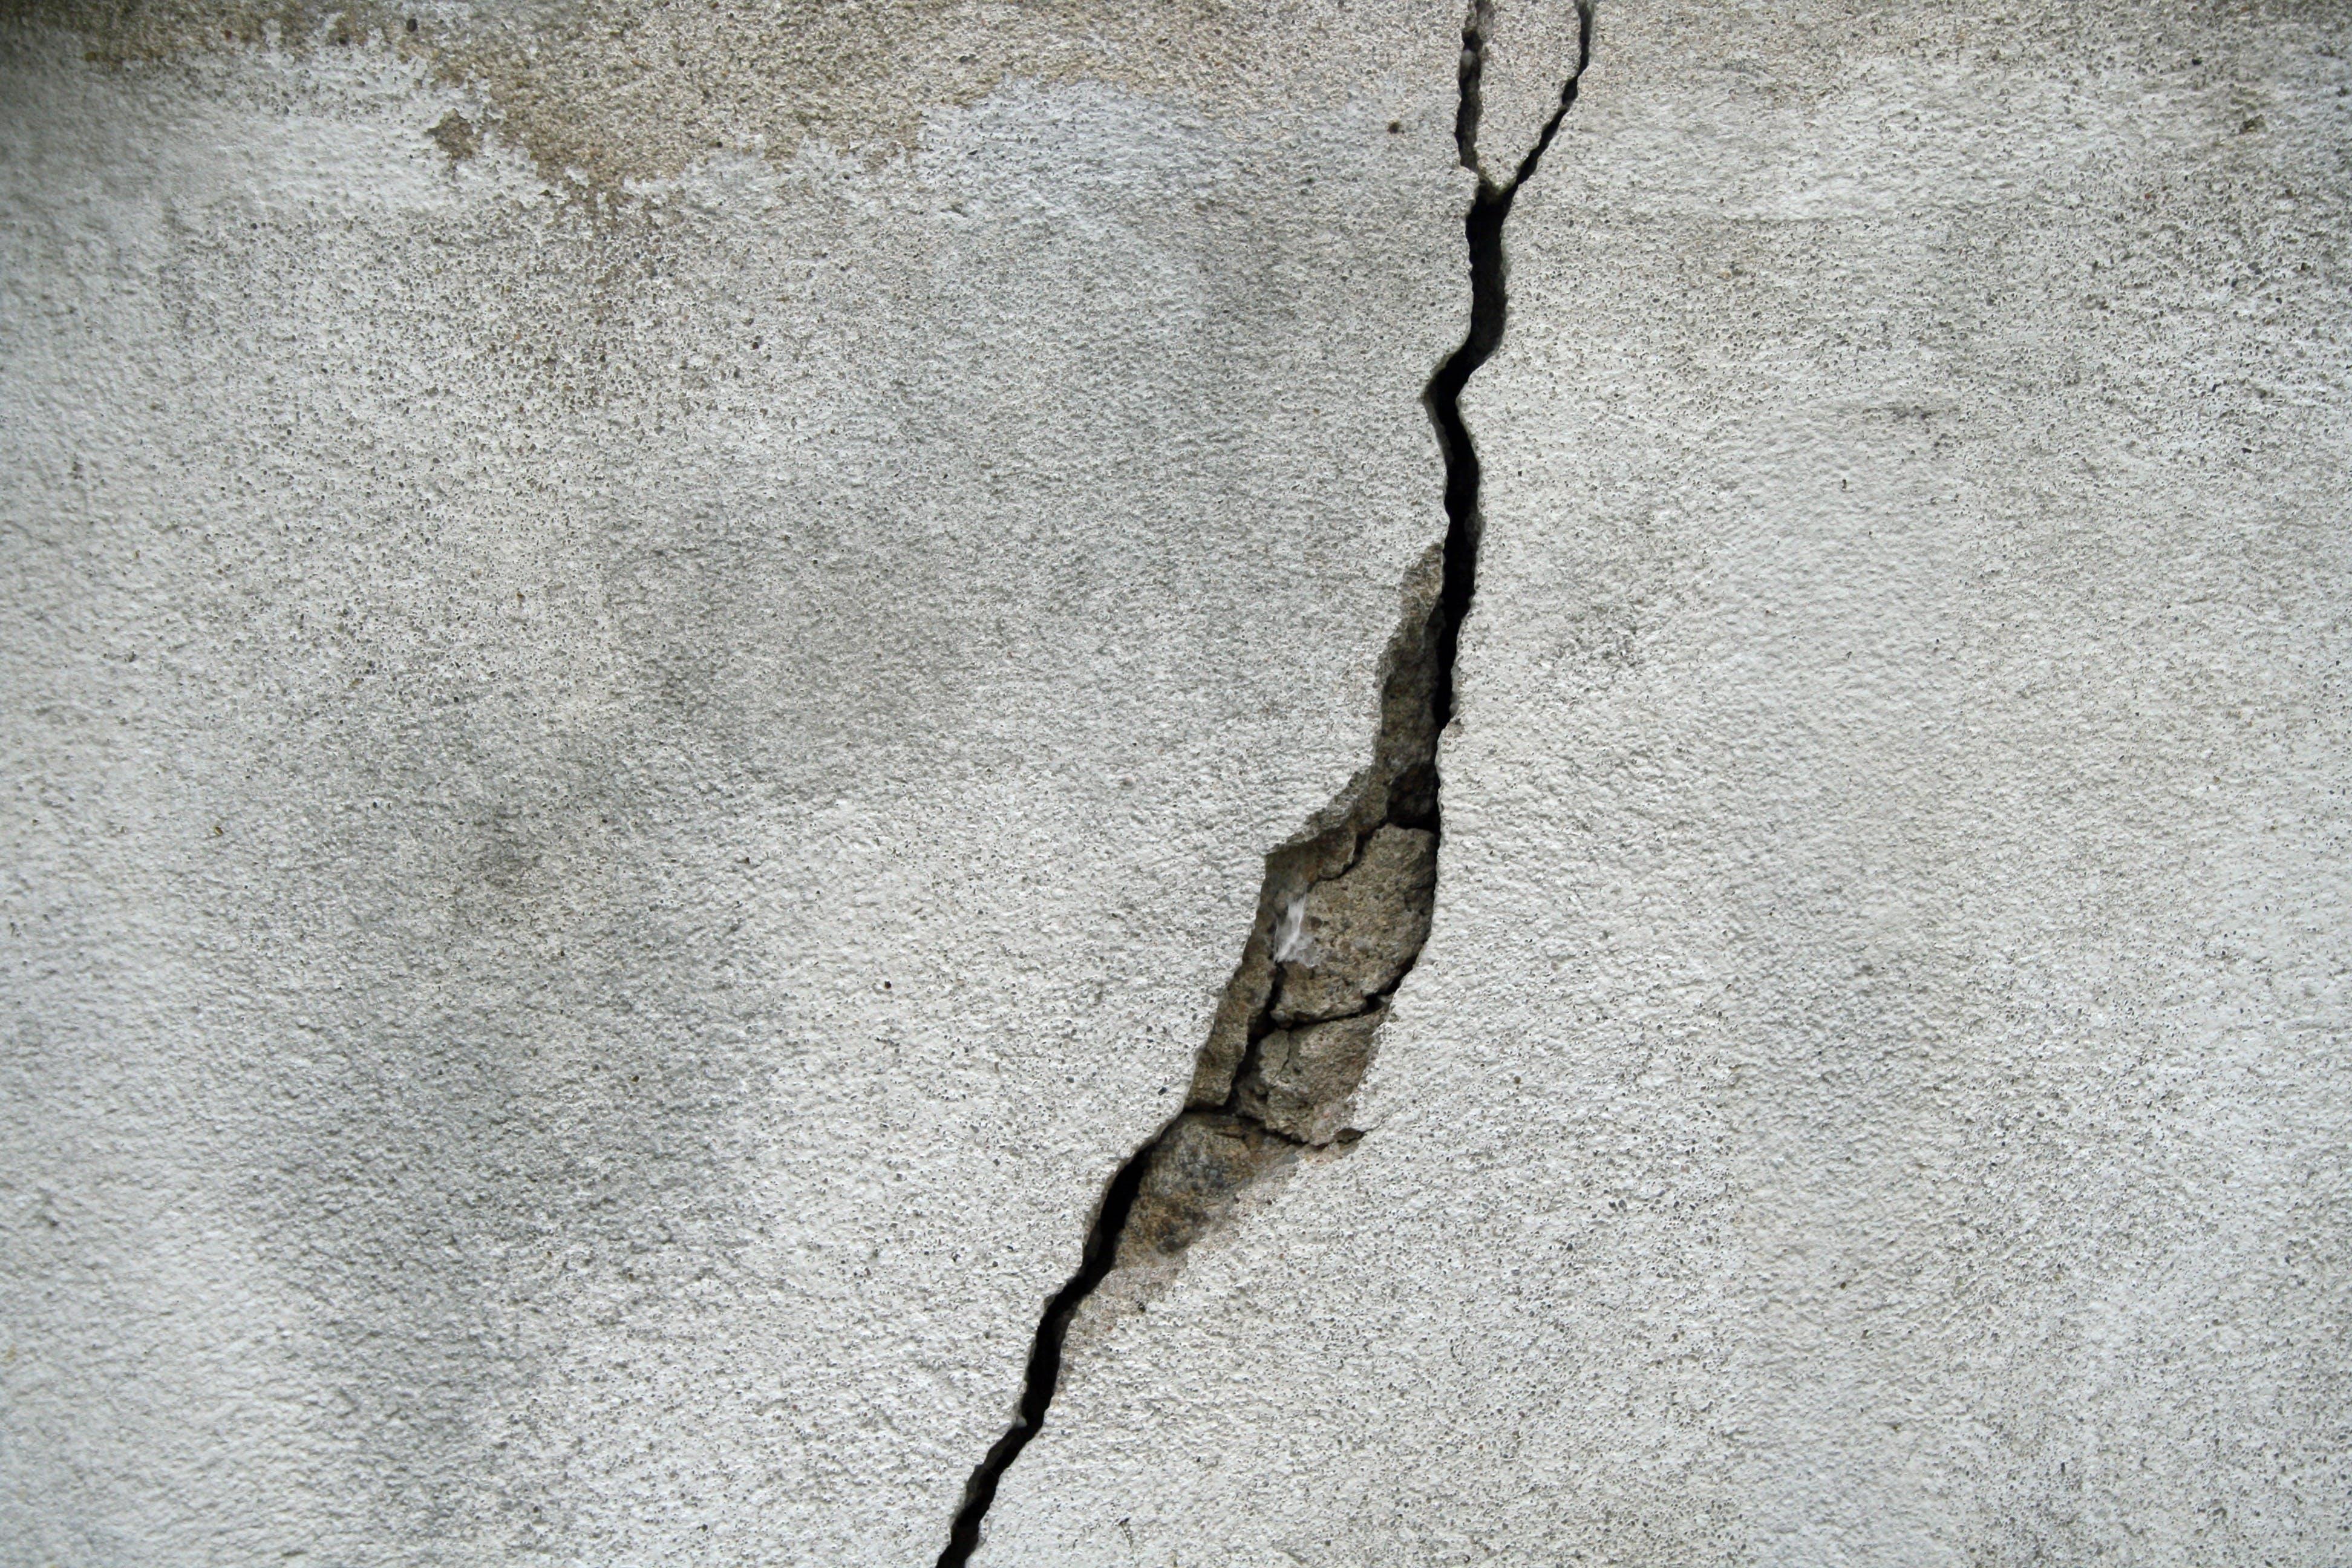 Riss-Wand-Spalte-Spaltung-Beton-695010-pixabay-struppi0601